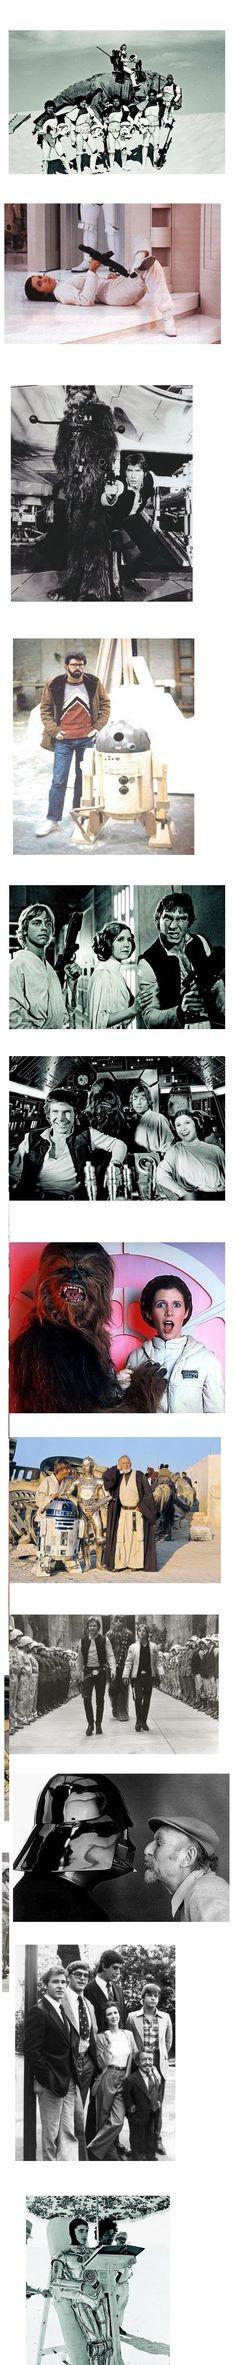 The Starwars Crew